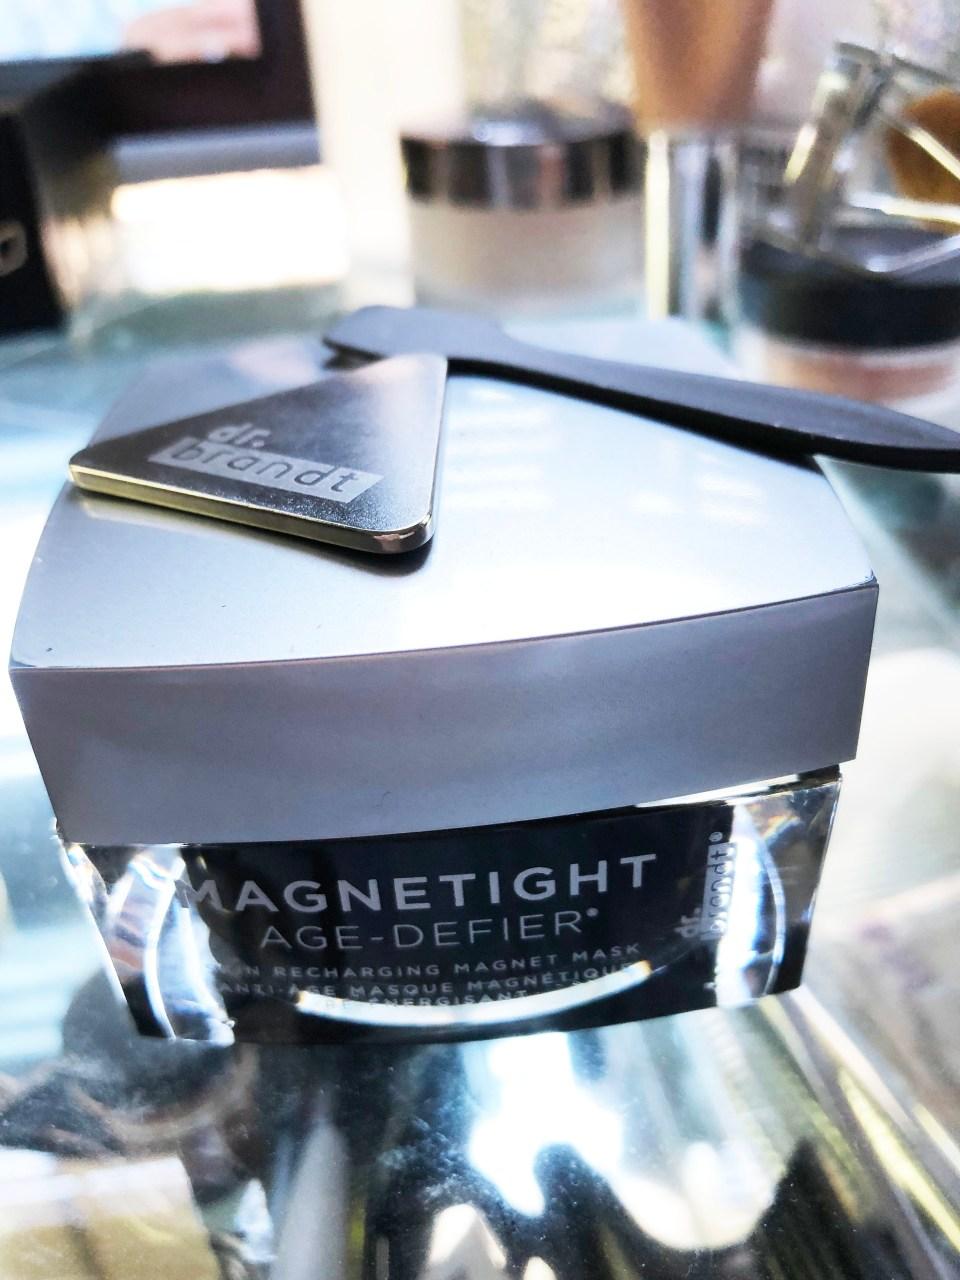 Magnetight Age-Defier Mask 2